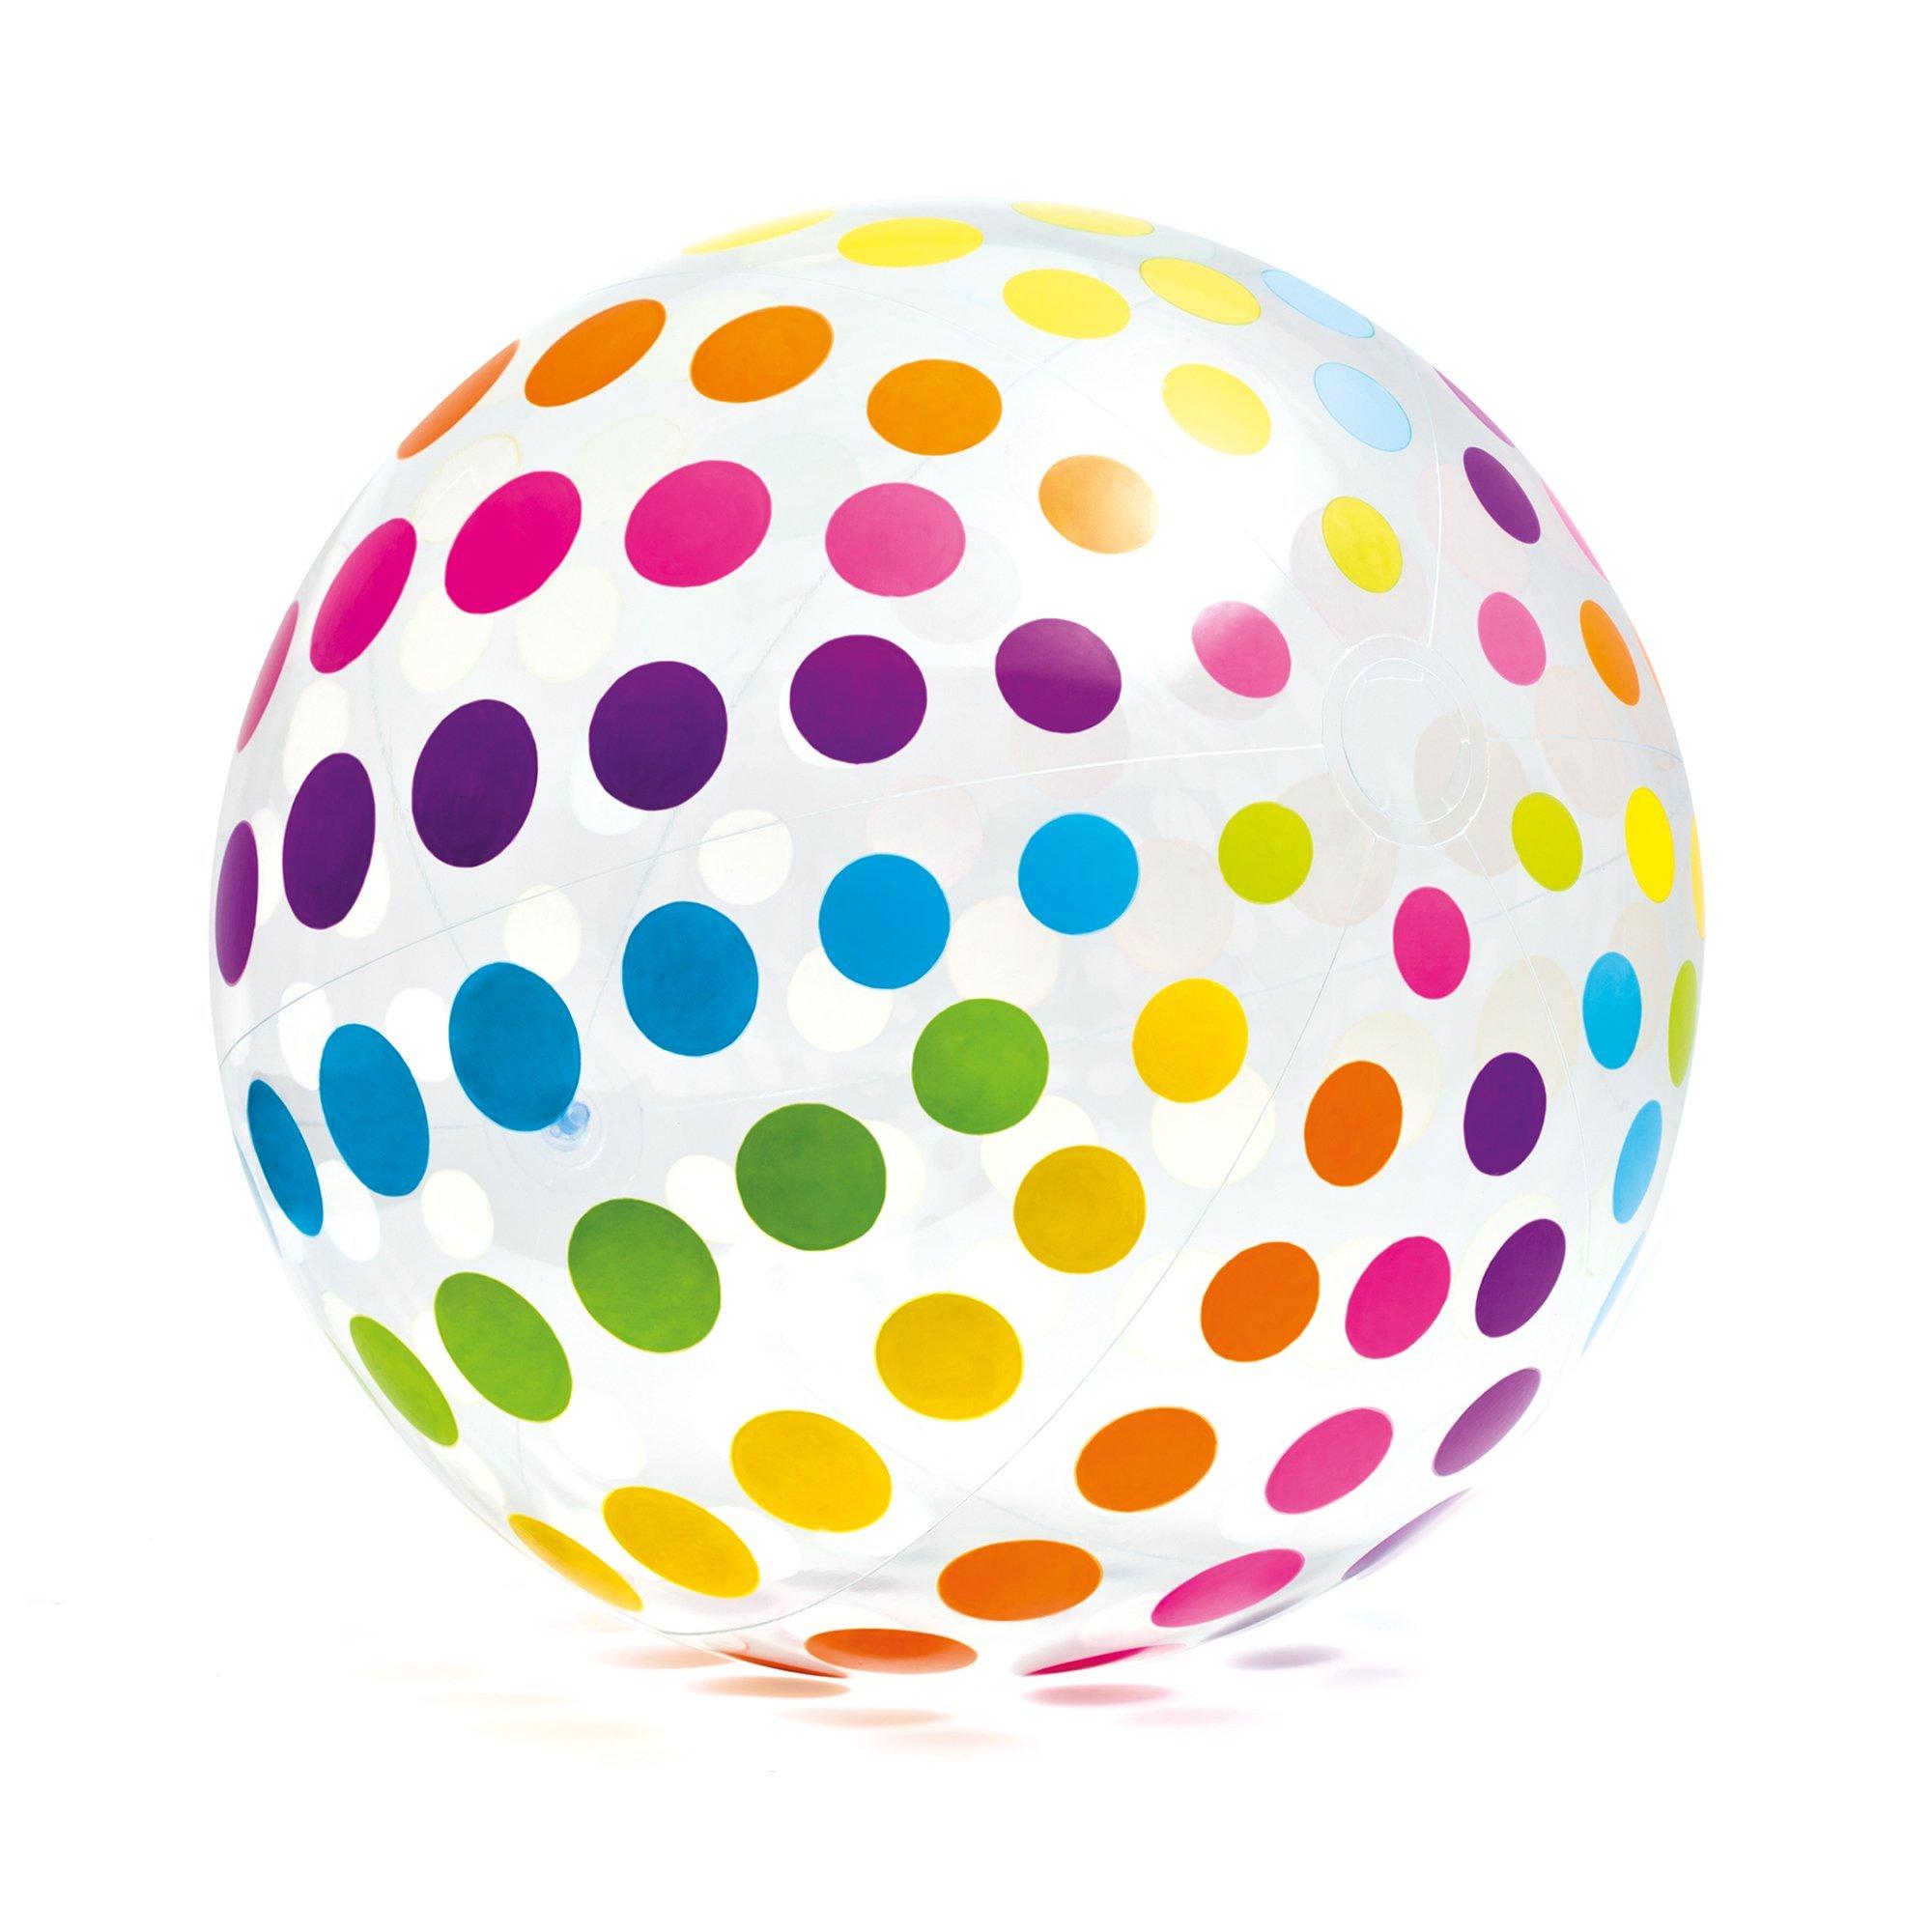 Intex 72-Inch Giant Colorful Beach Ball